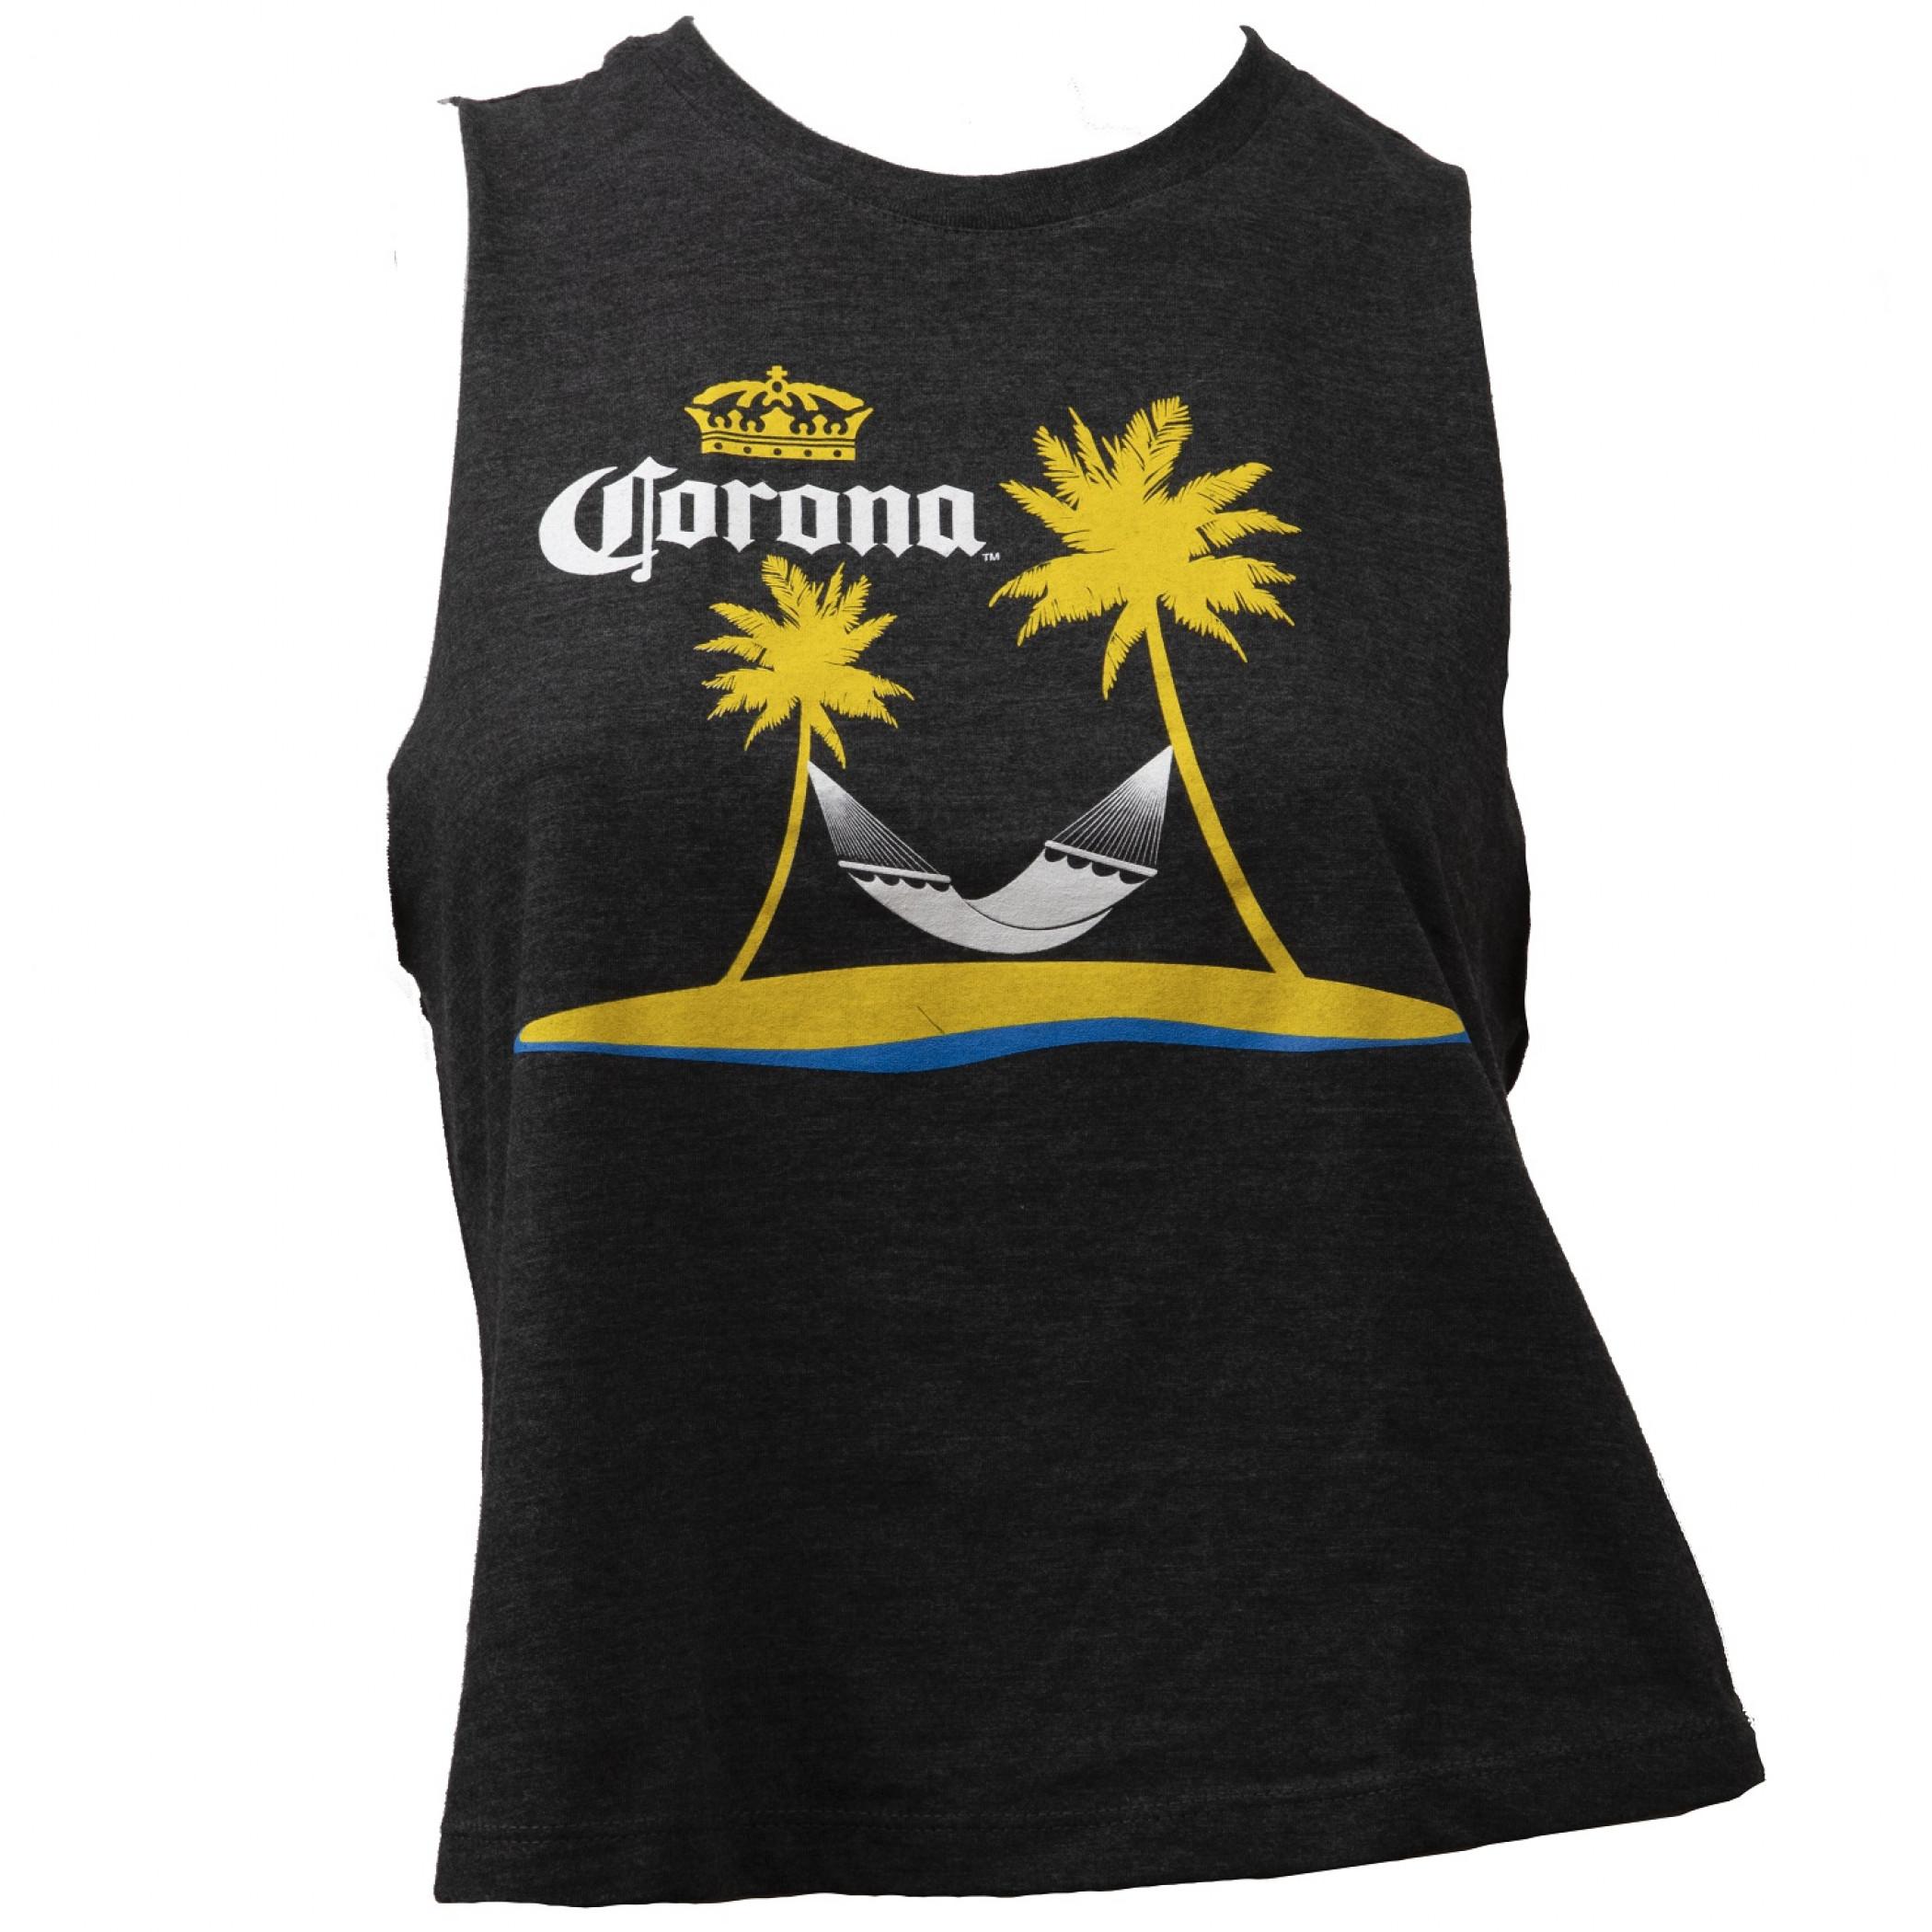 Corona Extra Summer Lifestyle Women's Racerback Tank Top